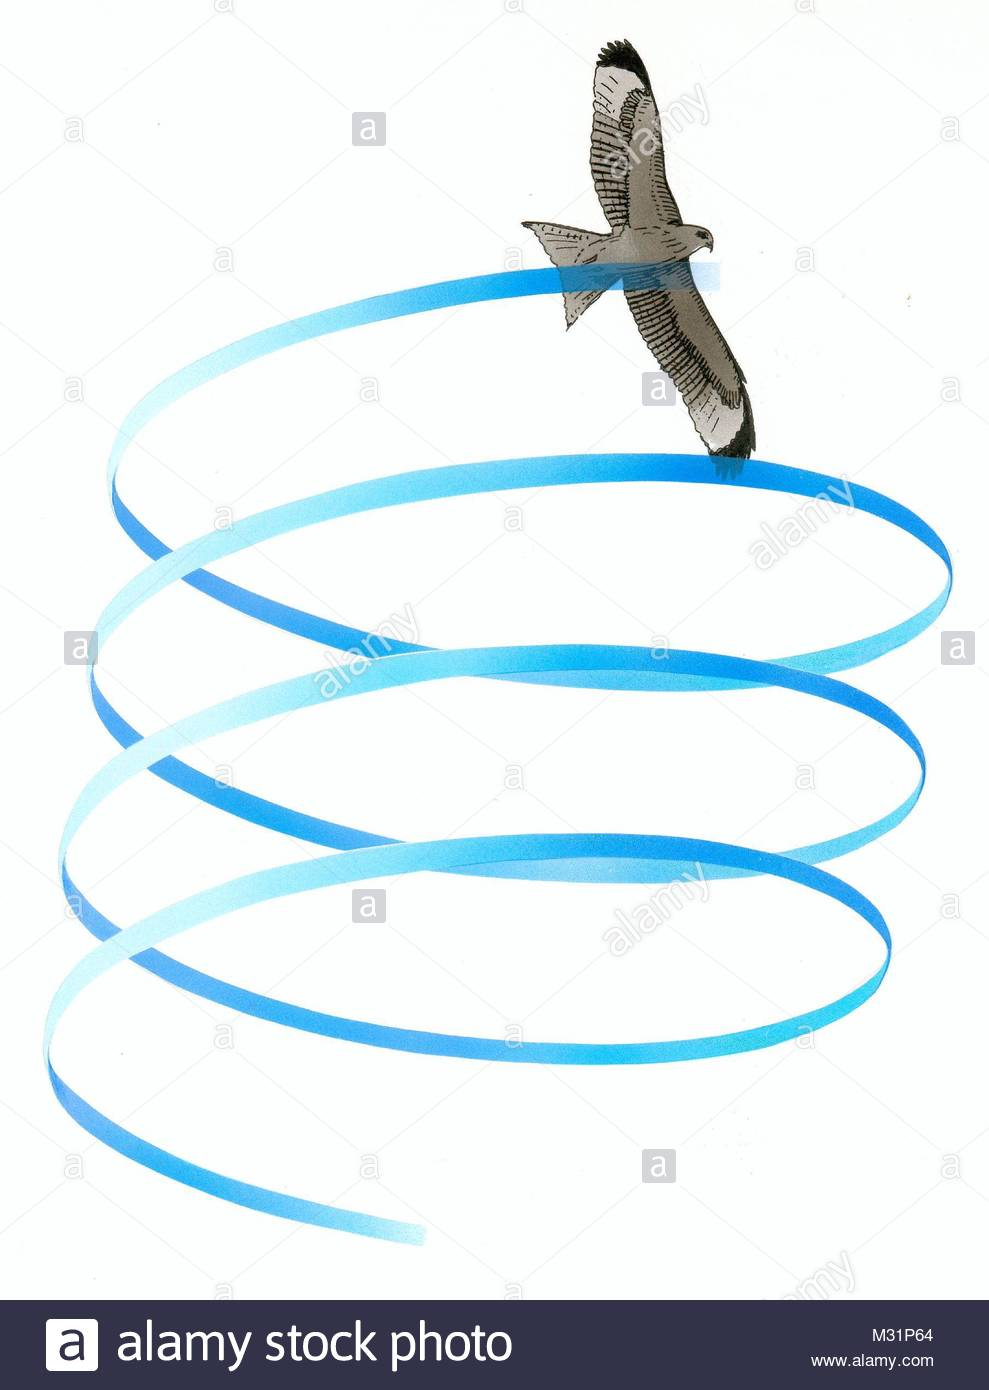 Red Kite Flying - Stock Image